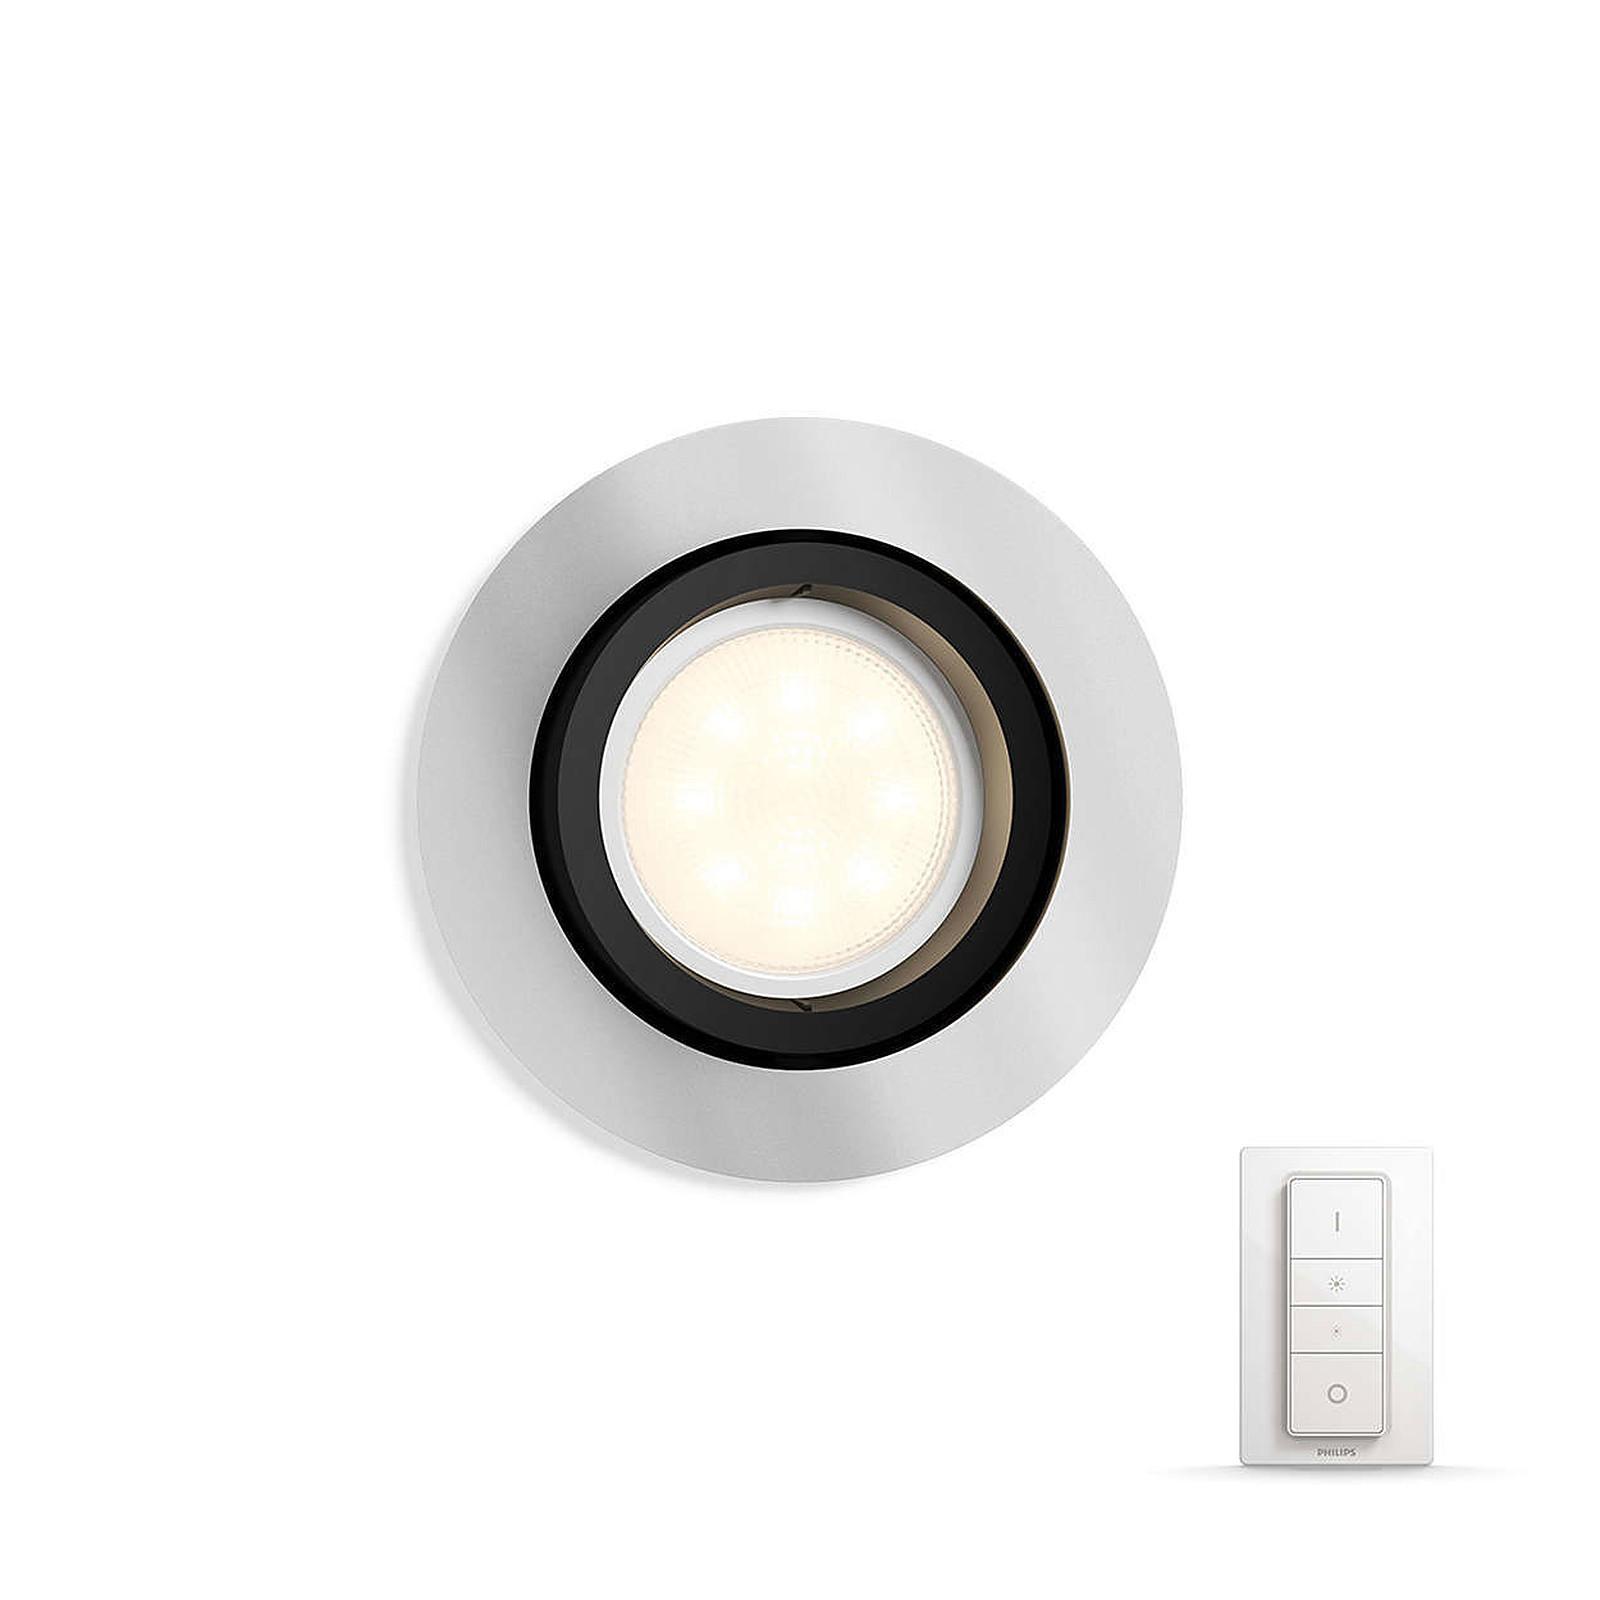 blanco recargable L/ámpara de lectura peque/ña y port/átil Makeup Fix USB camping 2 en 1 para leer a ni/ños Winzwon